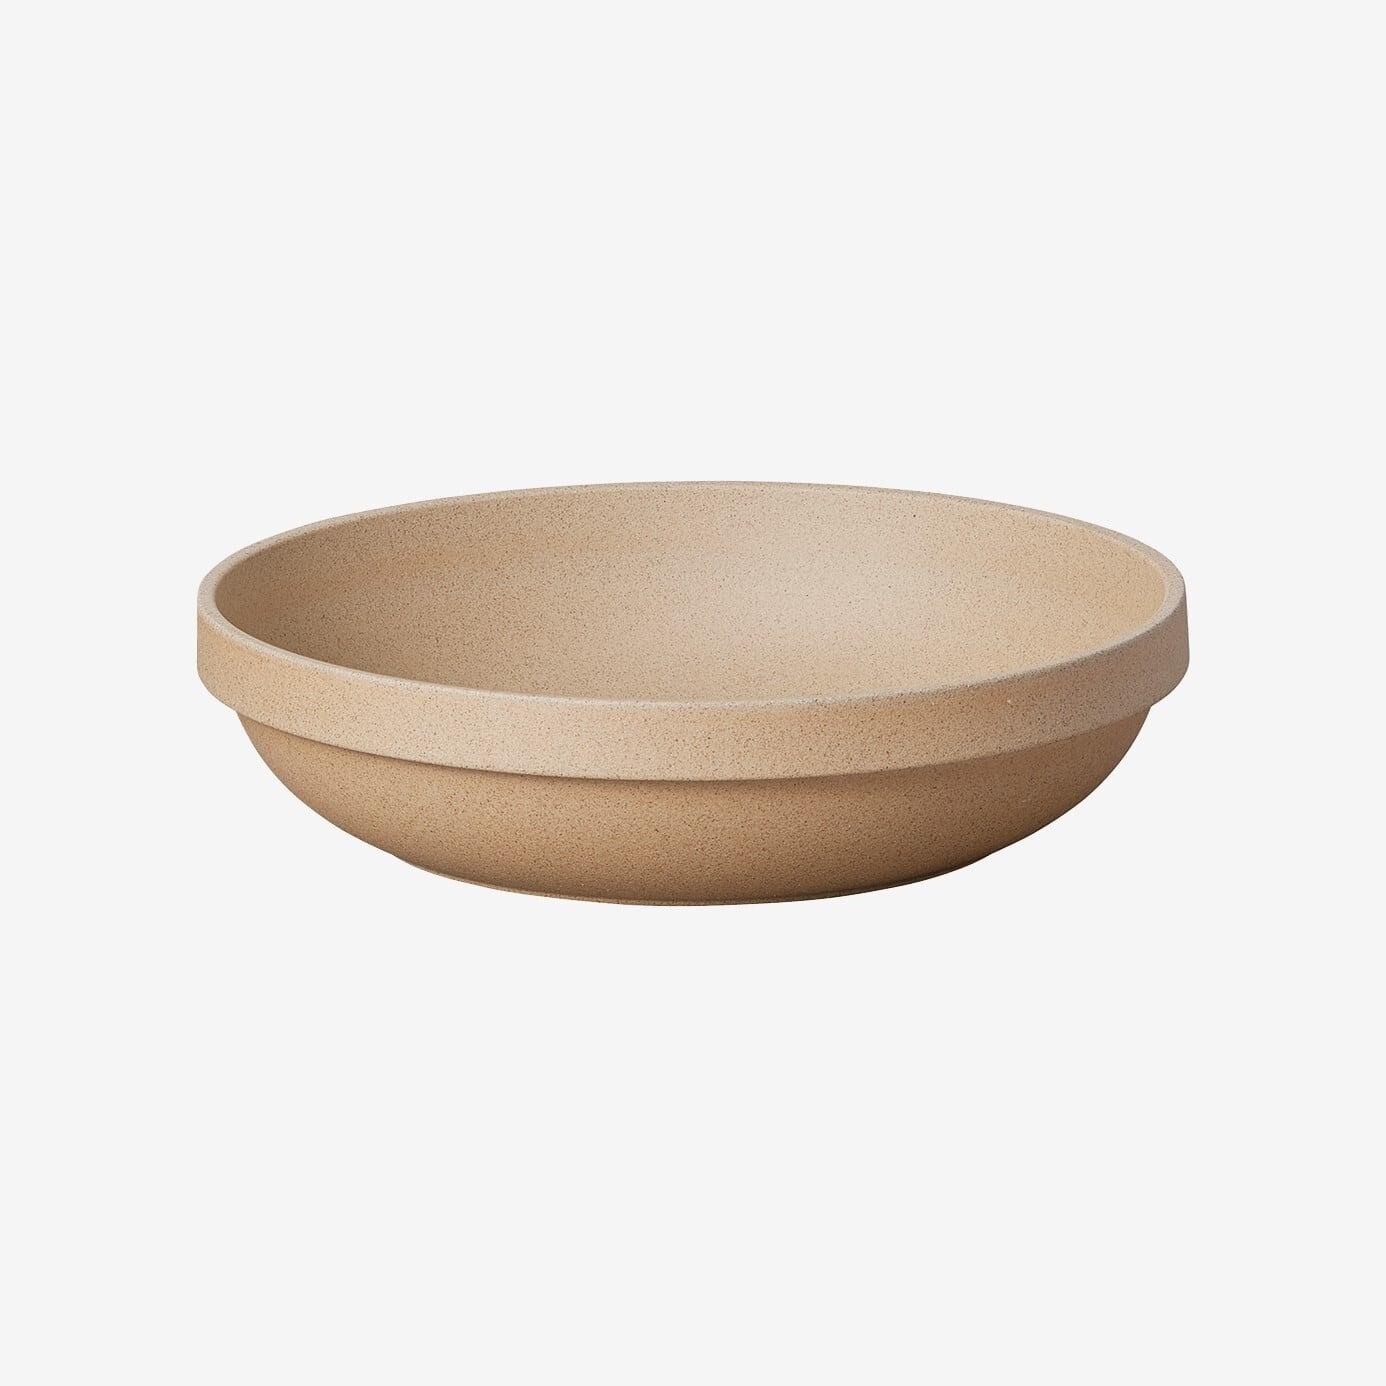 HASAMI PORCELAIN (ハサミポーセリン) Round Bowl (Natural/ ナチュラル) 【220x55】HP033